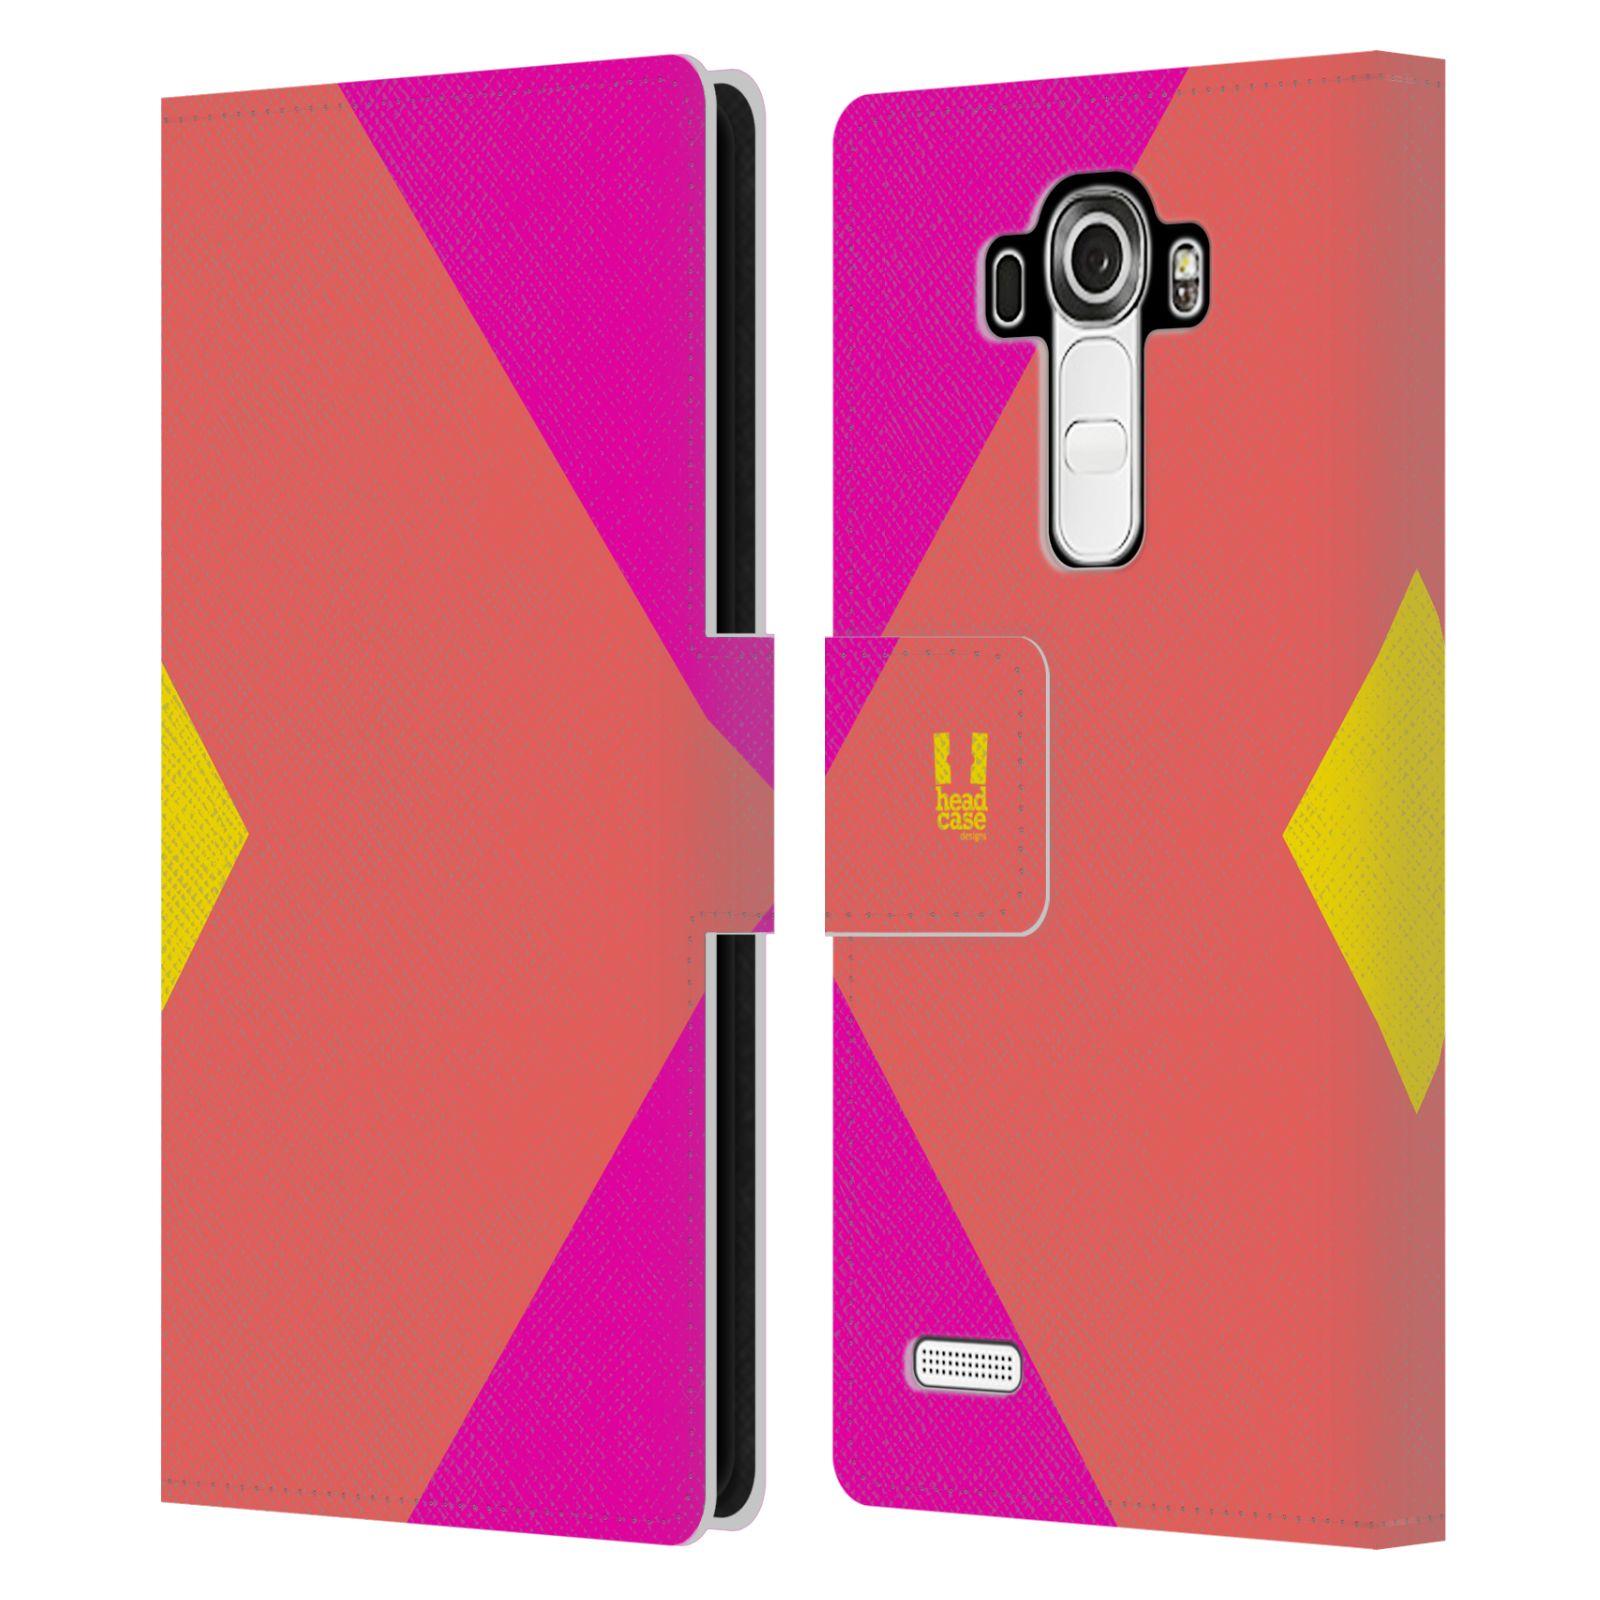 HEAD CASE Flipové pouzdro pro mobil LG G4 barevné tvary růžová korál